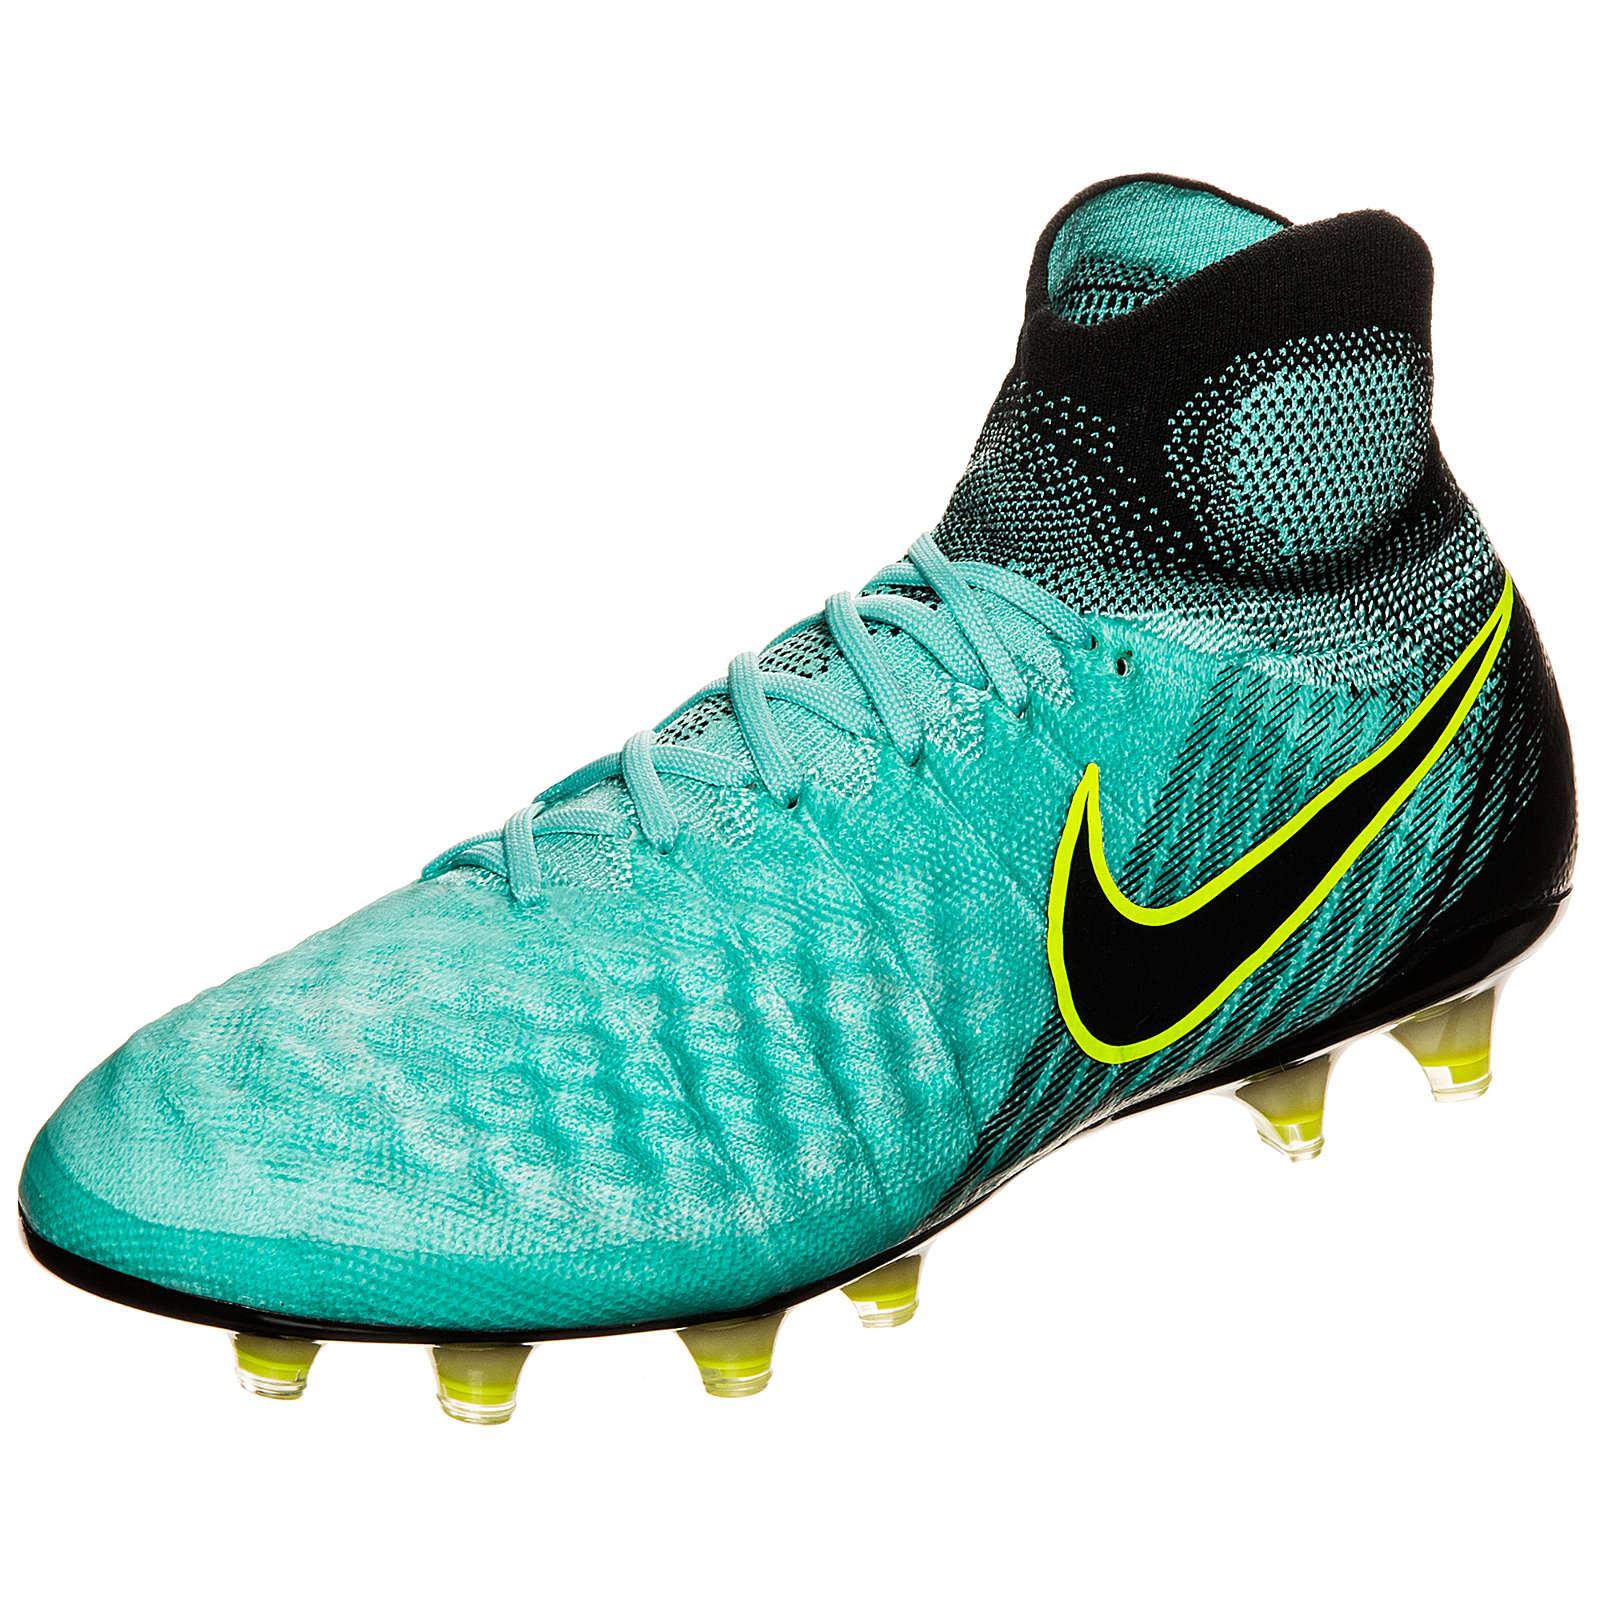 Nike Performance Nike Magista Obra II FG Fußballschuh Damen türkis Damen Gr. 38,5